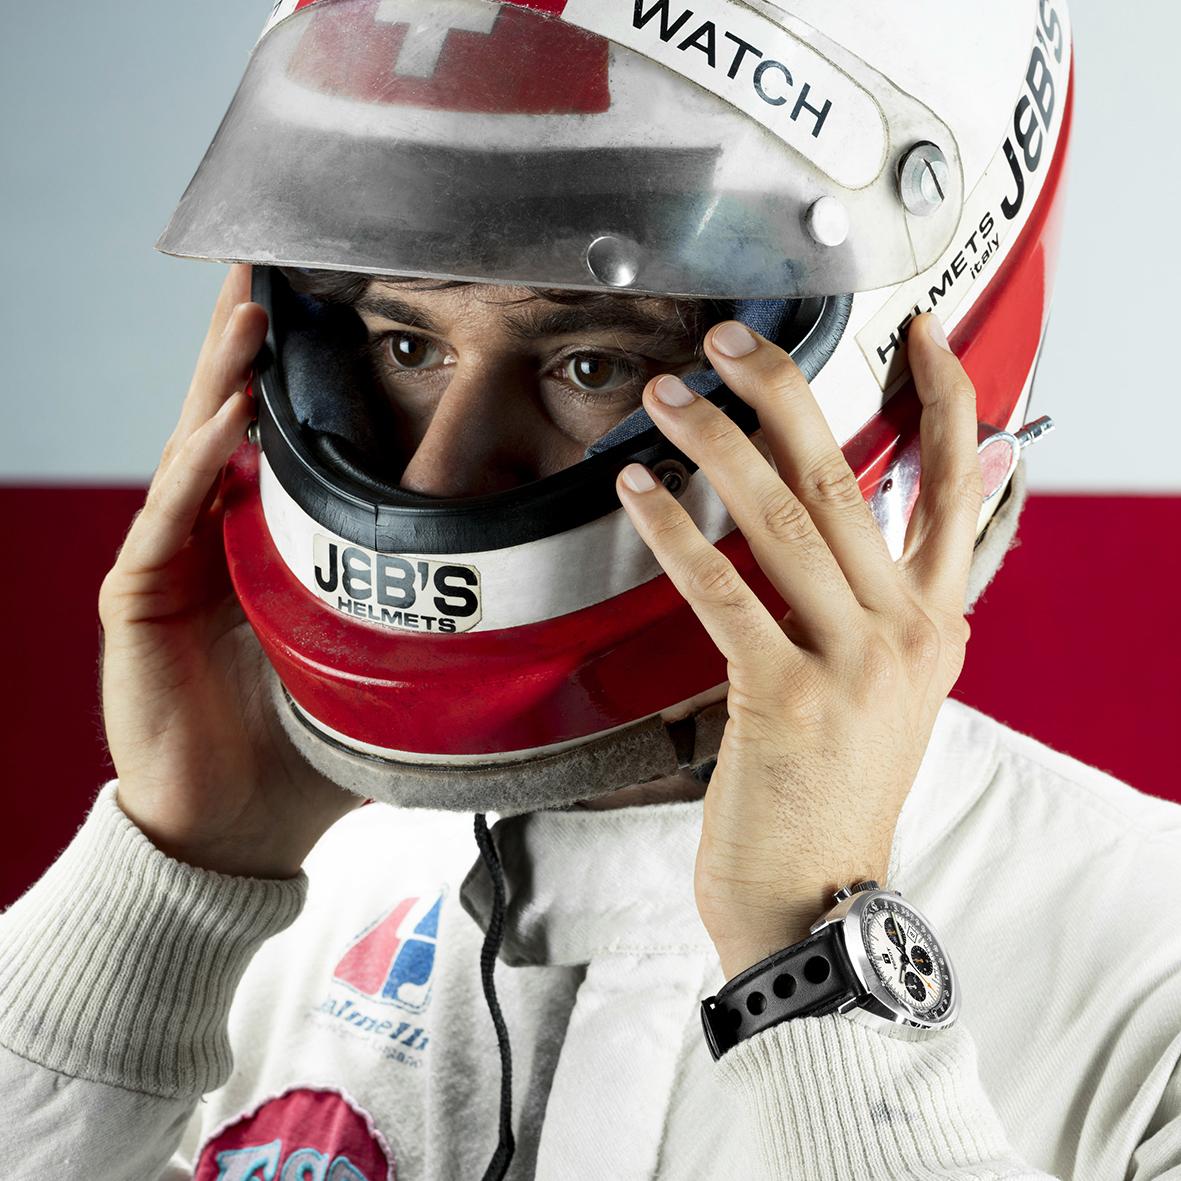 Loris Kessel jako prawdziwy pasjonat motoryzacji.